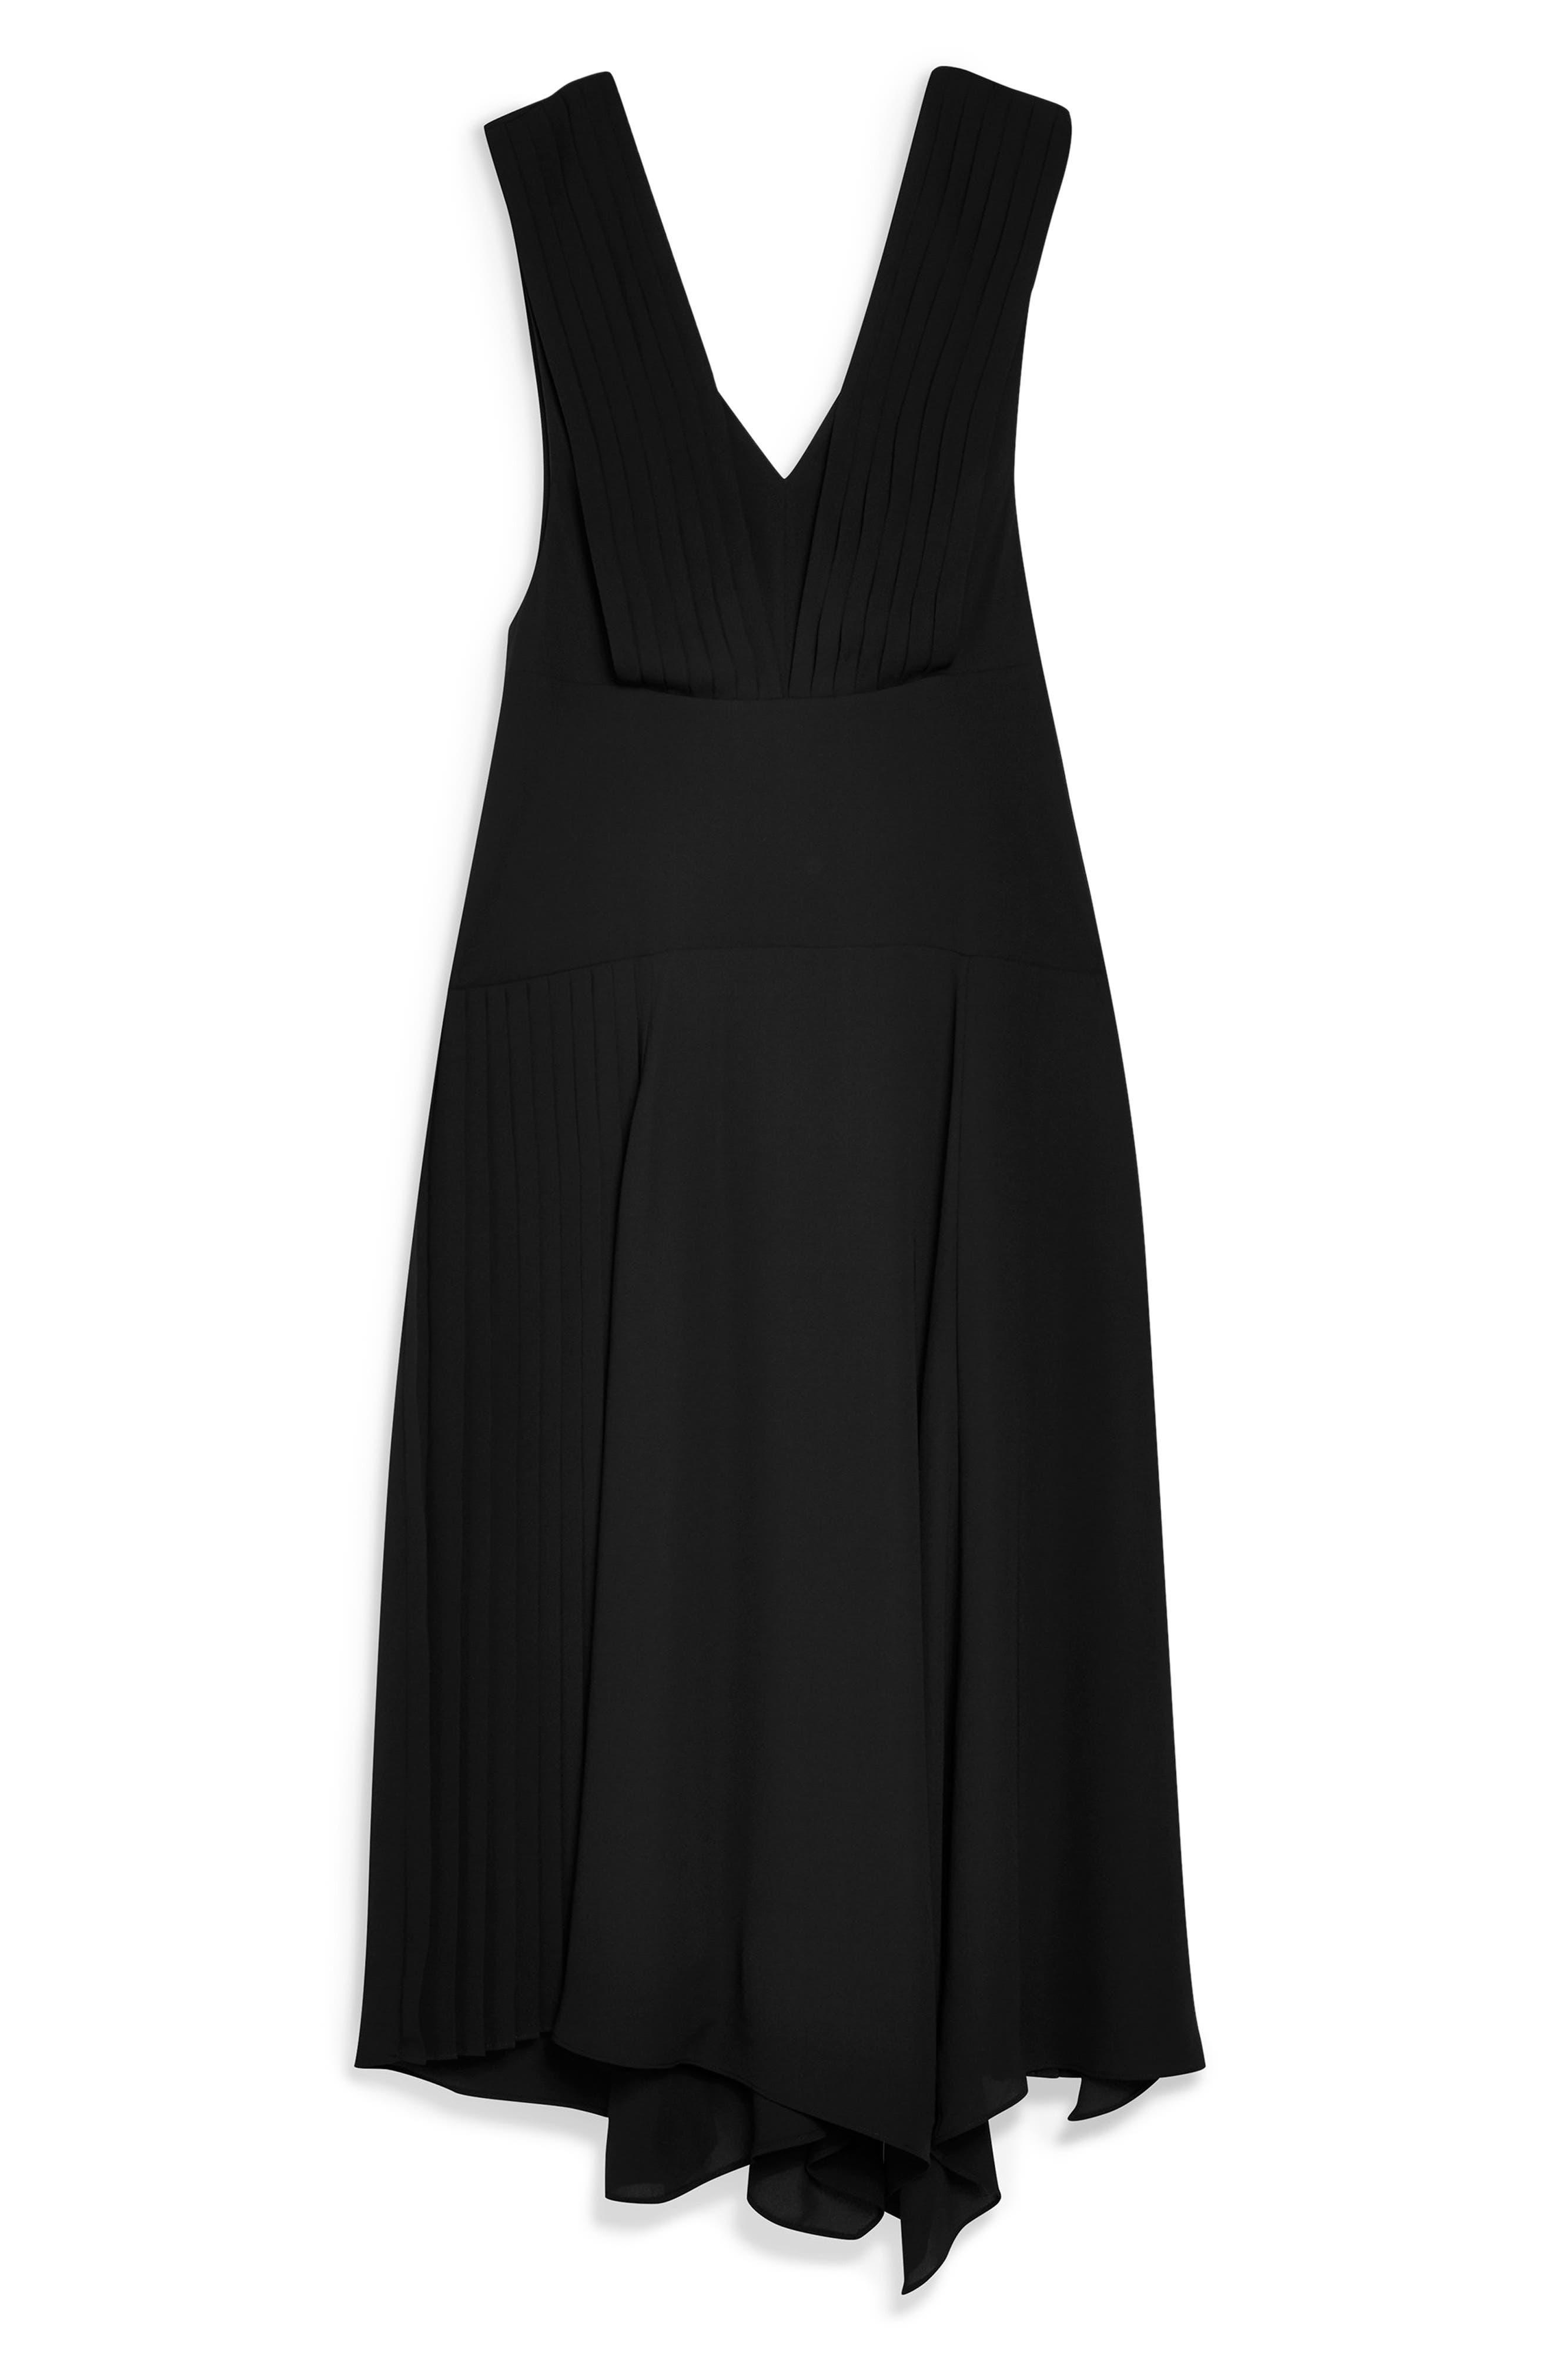 TOPSHOP, Pleated Pinafore Midi Dress, Alternate thumbnail 5, color, BLACK